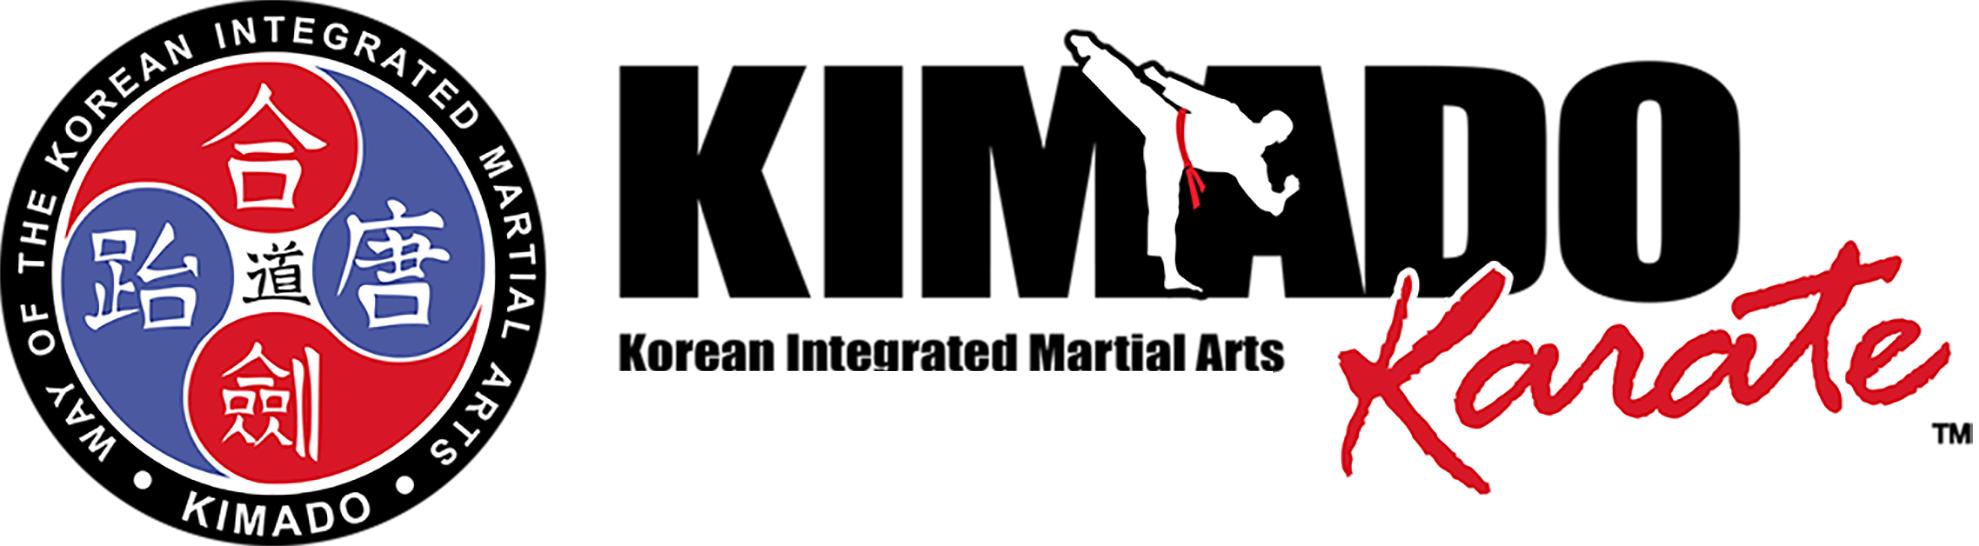 Korean Integrated Martial Arts